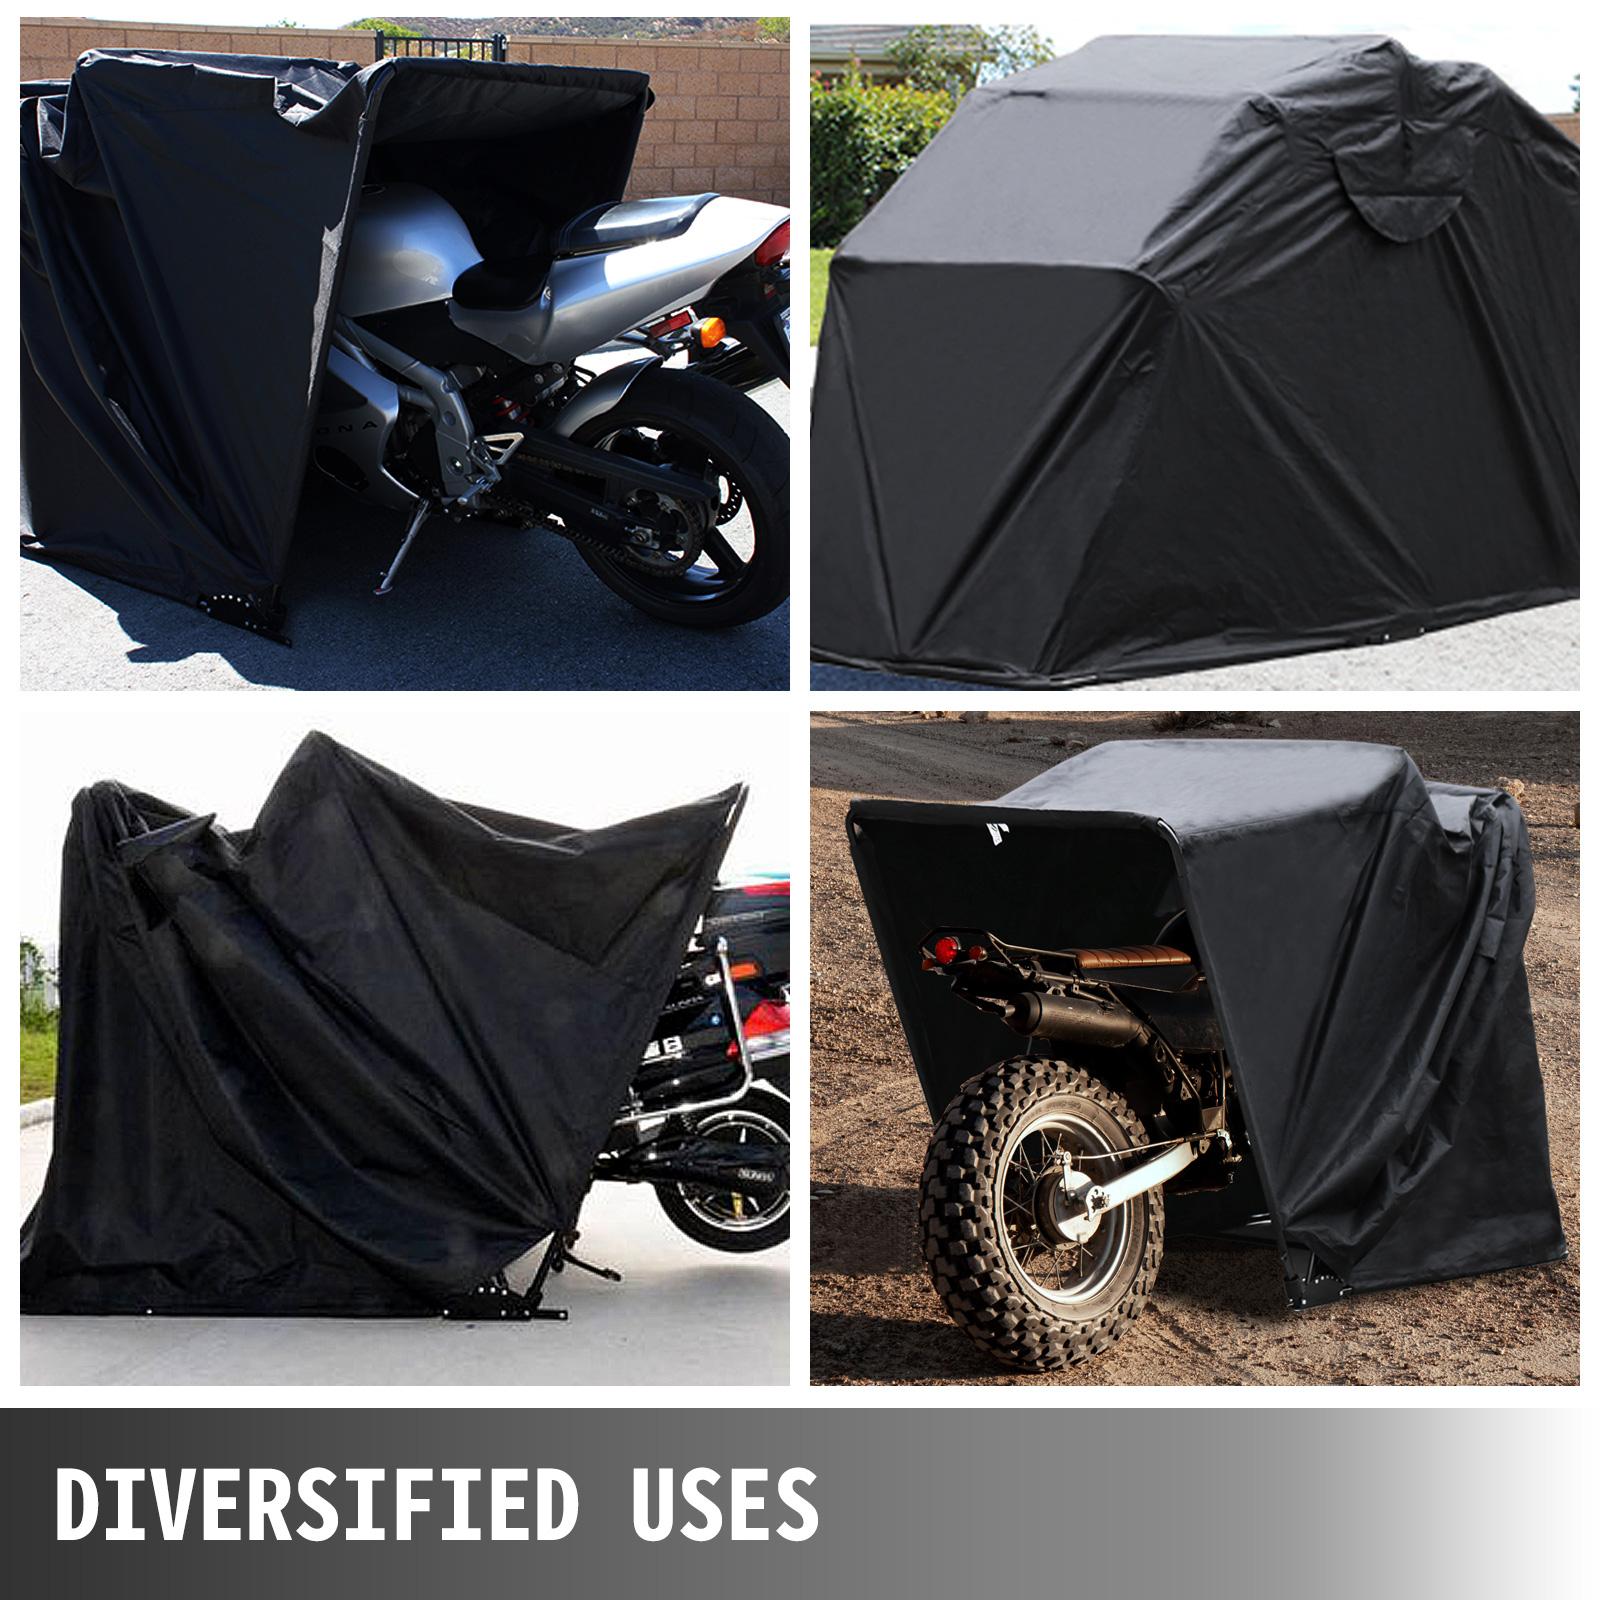 waterproof,motorcycle shelter, UV protected